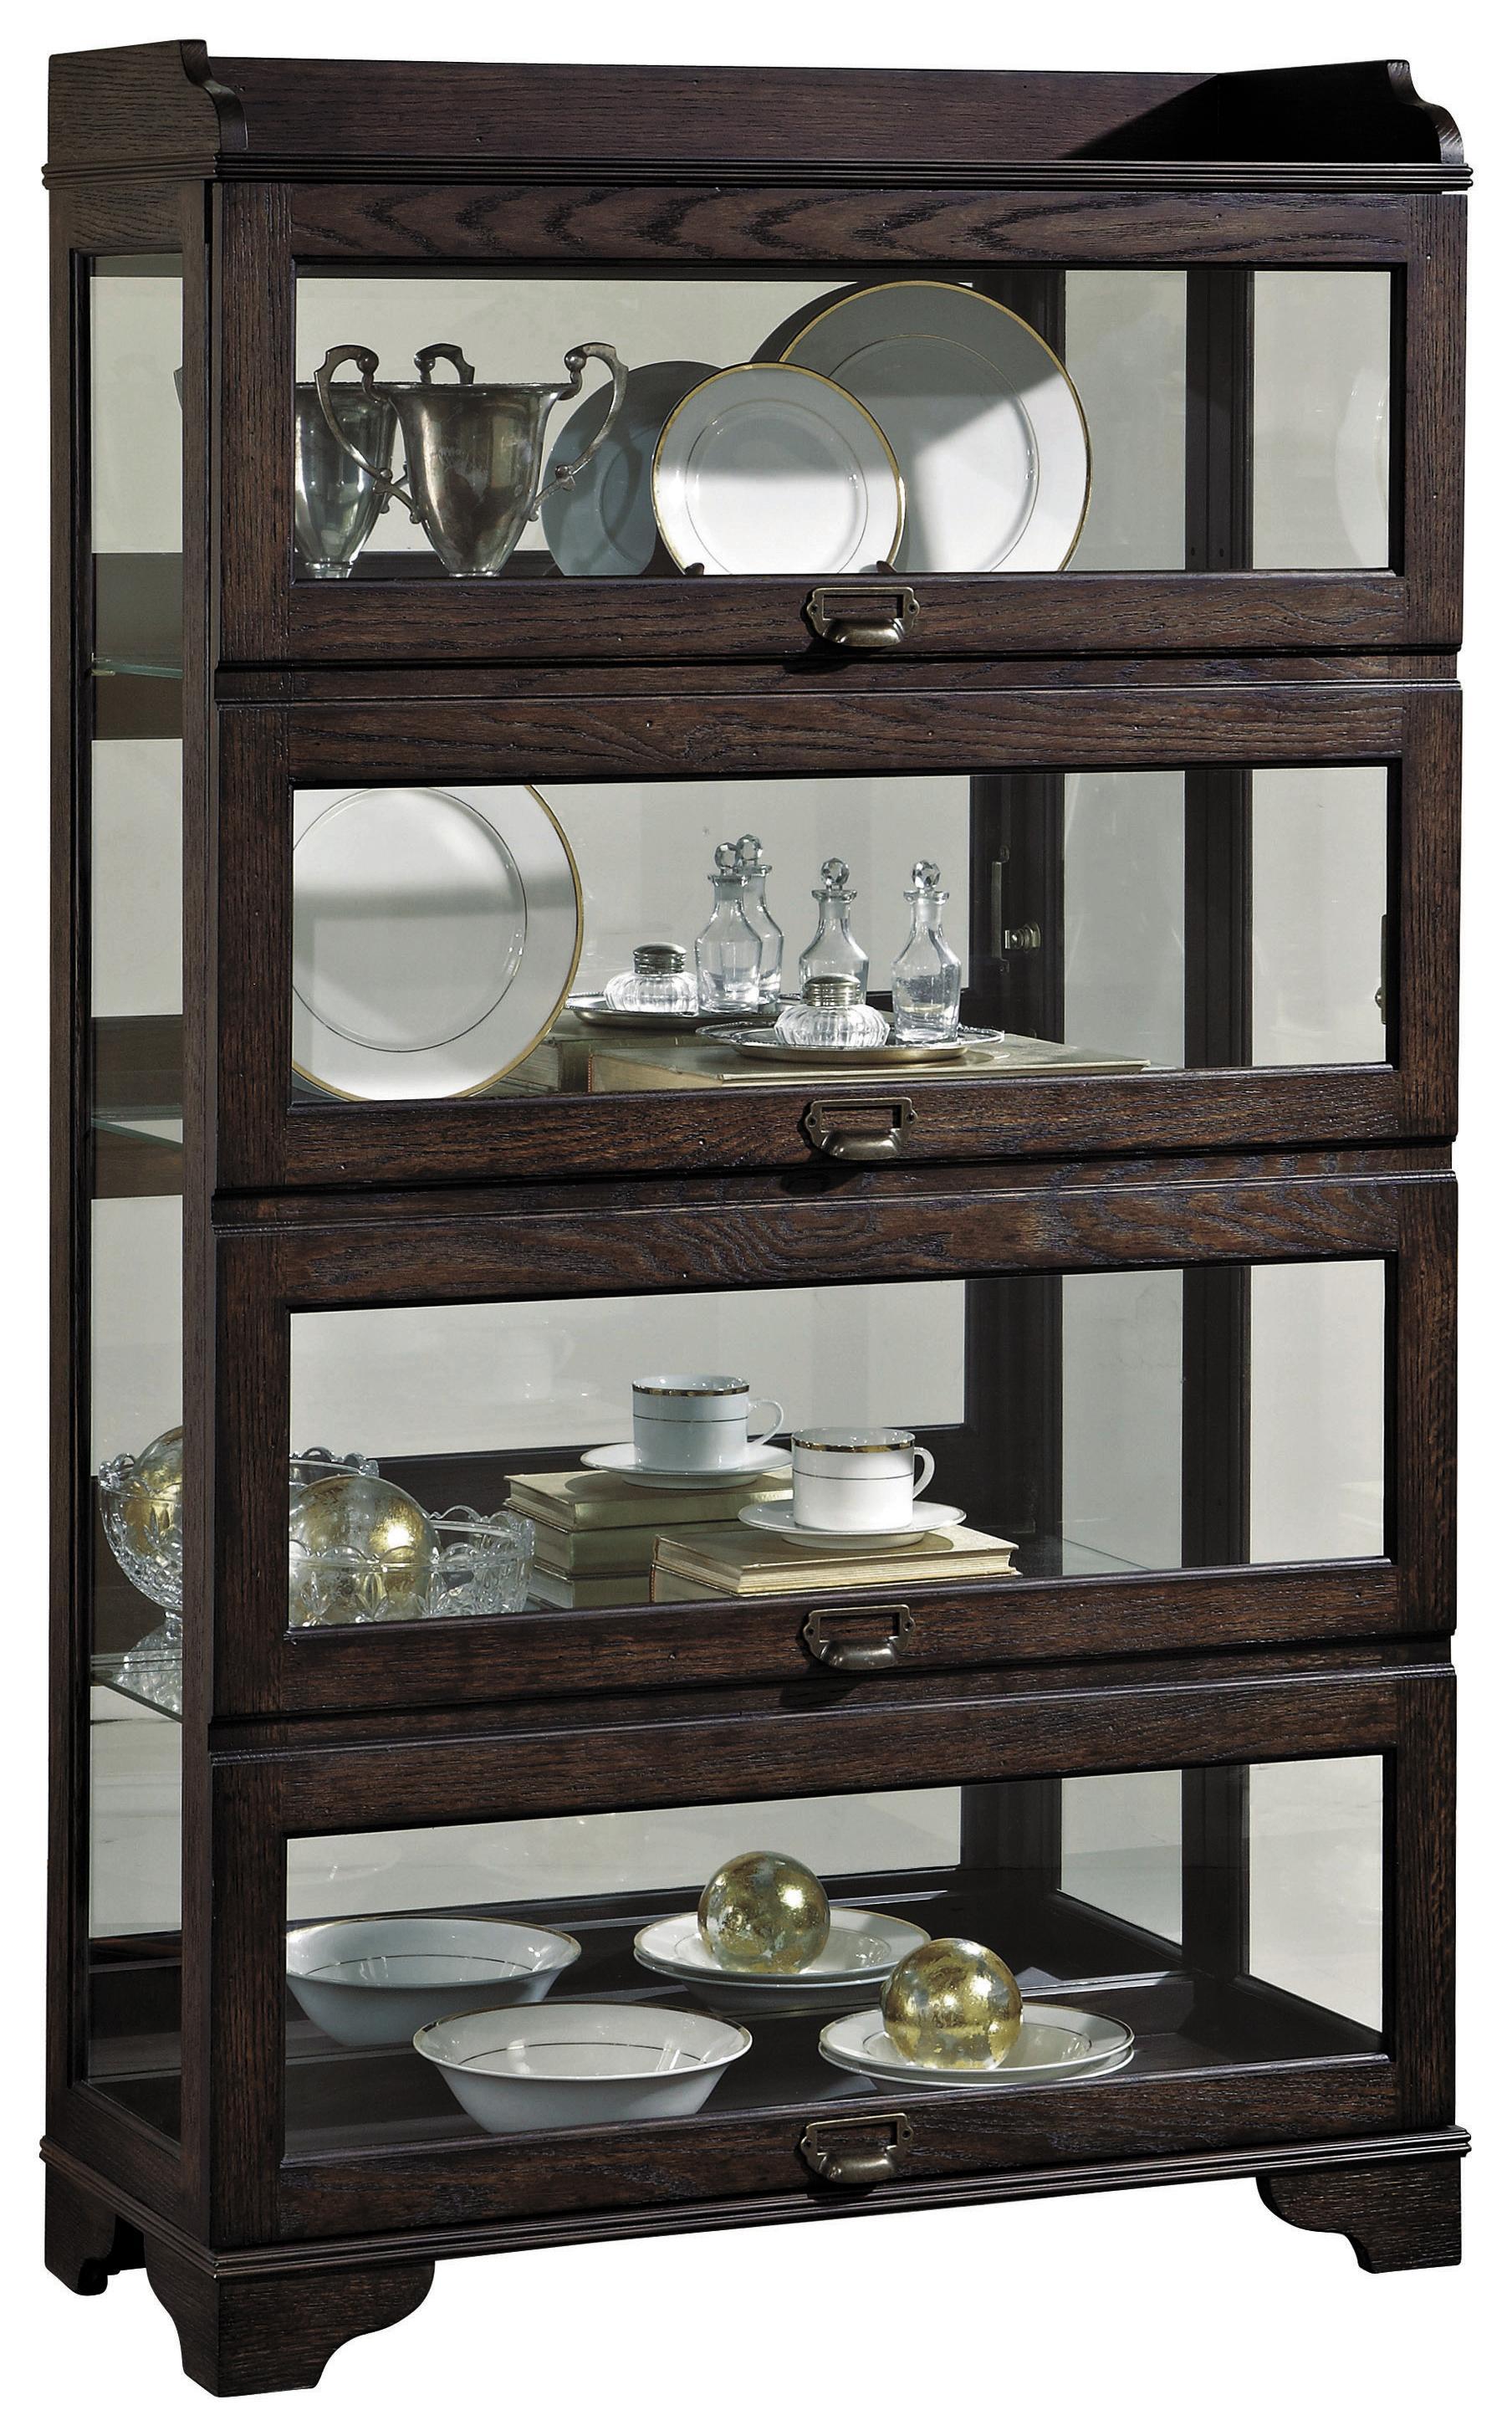 Pulaski Furniture Curios Low Sliding Front Curio Olinde 39 S Furniture Curio Cabinet